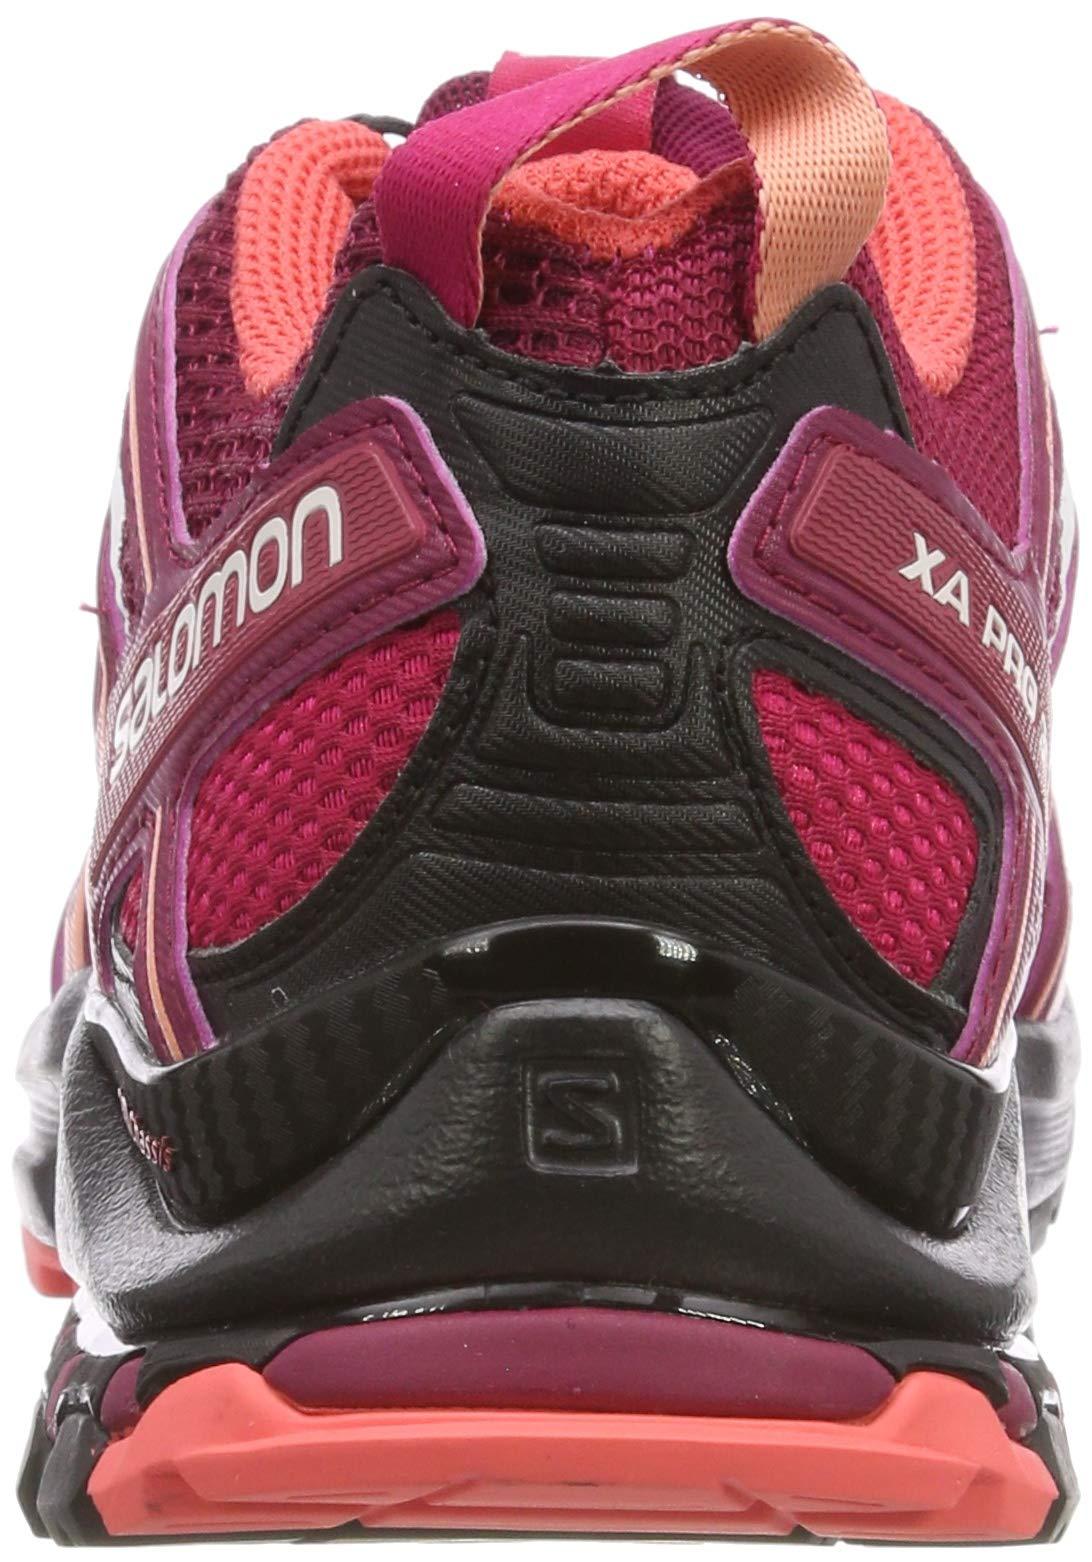 717C1DfhASL - SALOMON Women's Xa Pro 3D W Trail Running Shoes